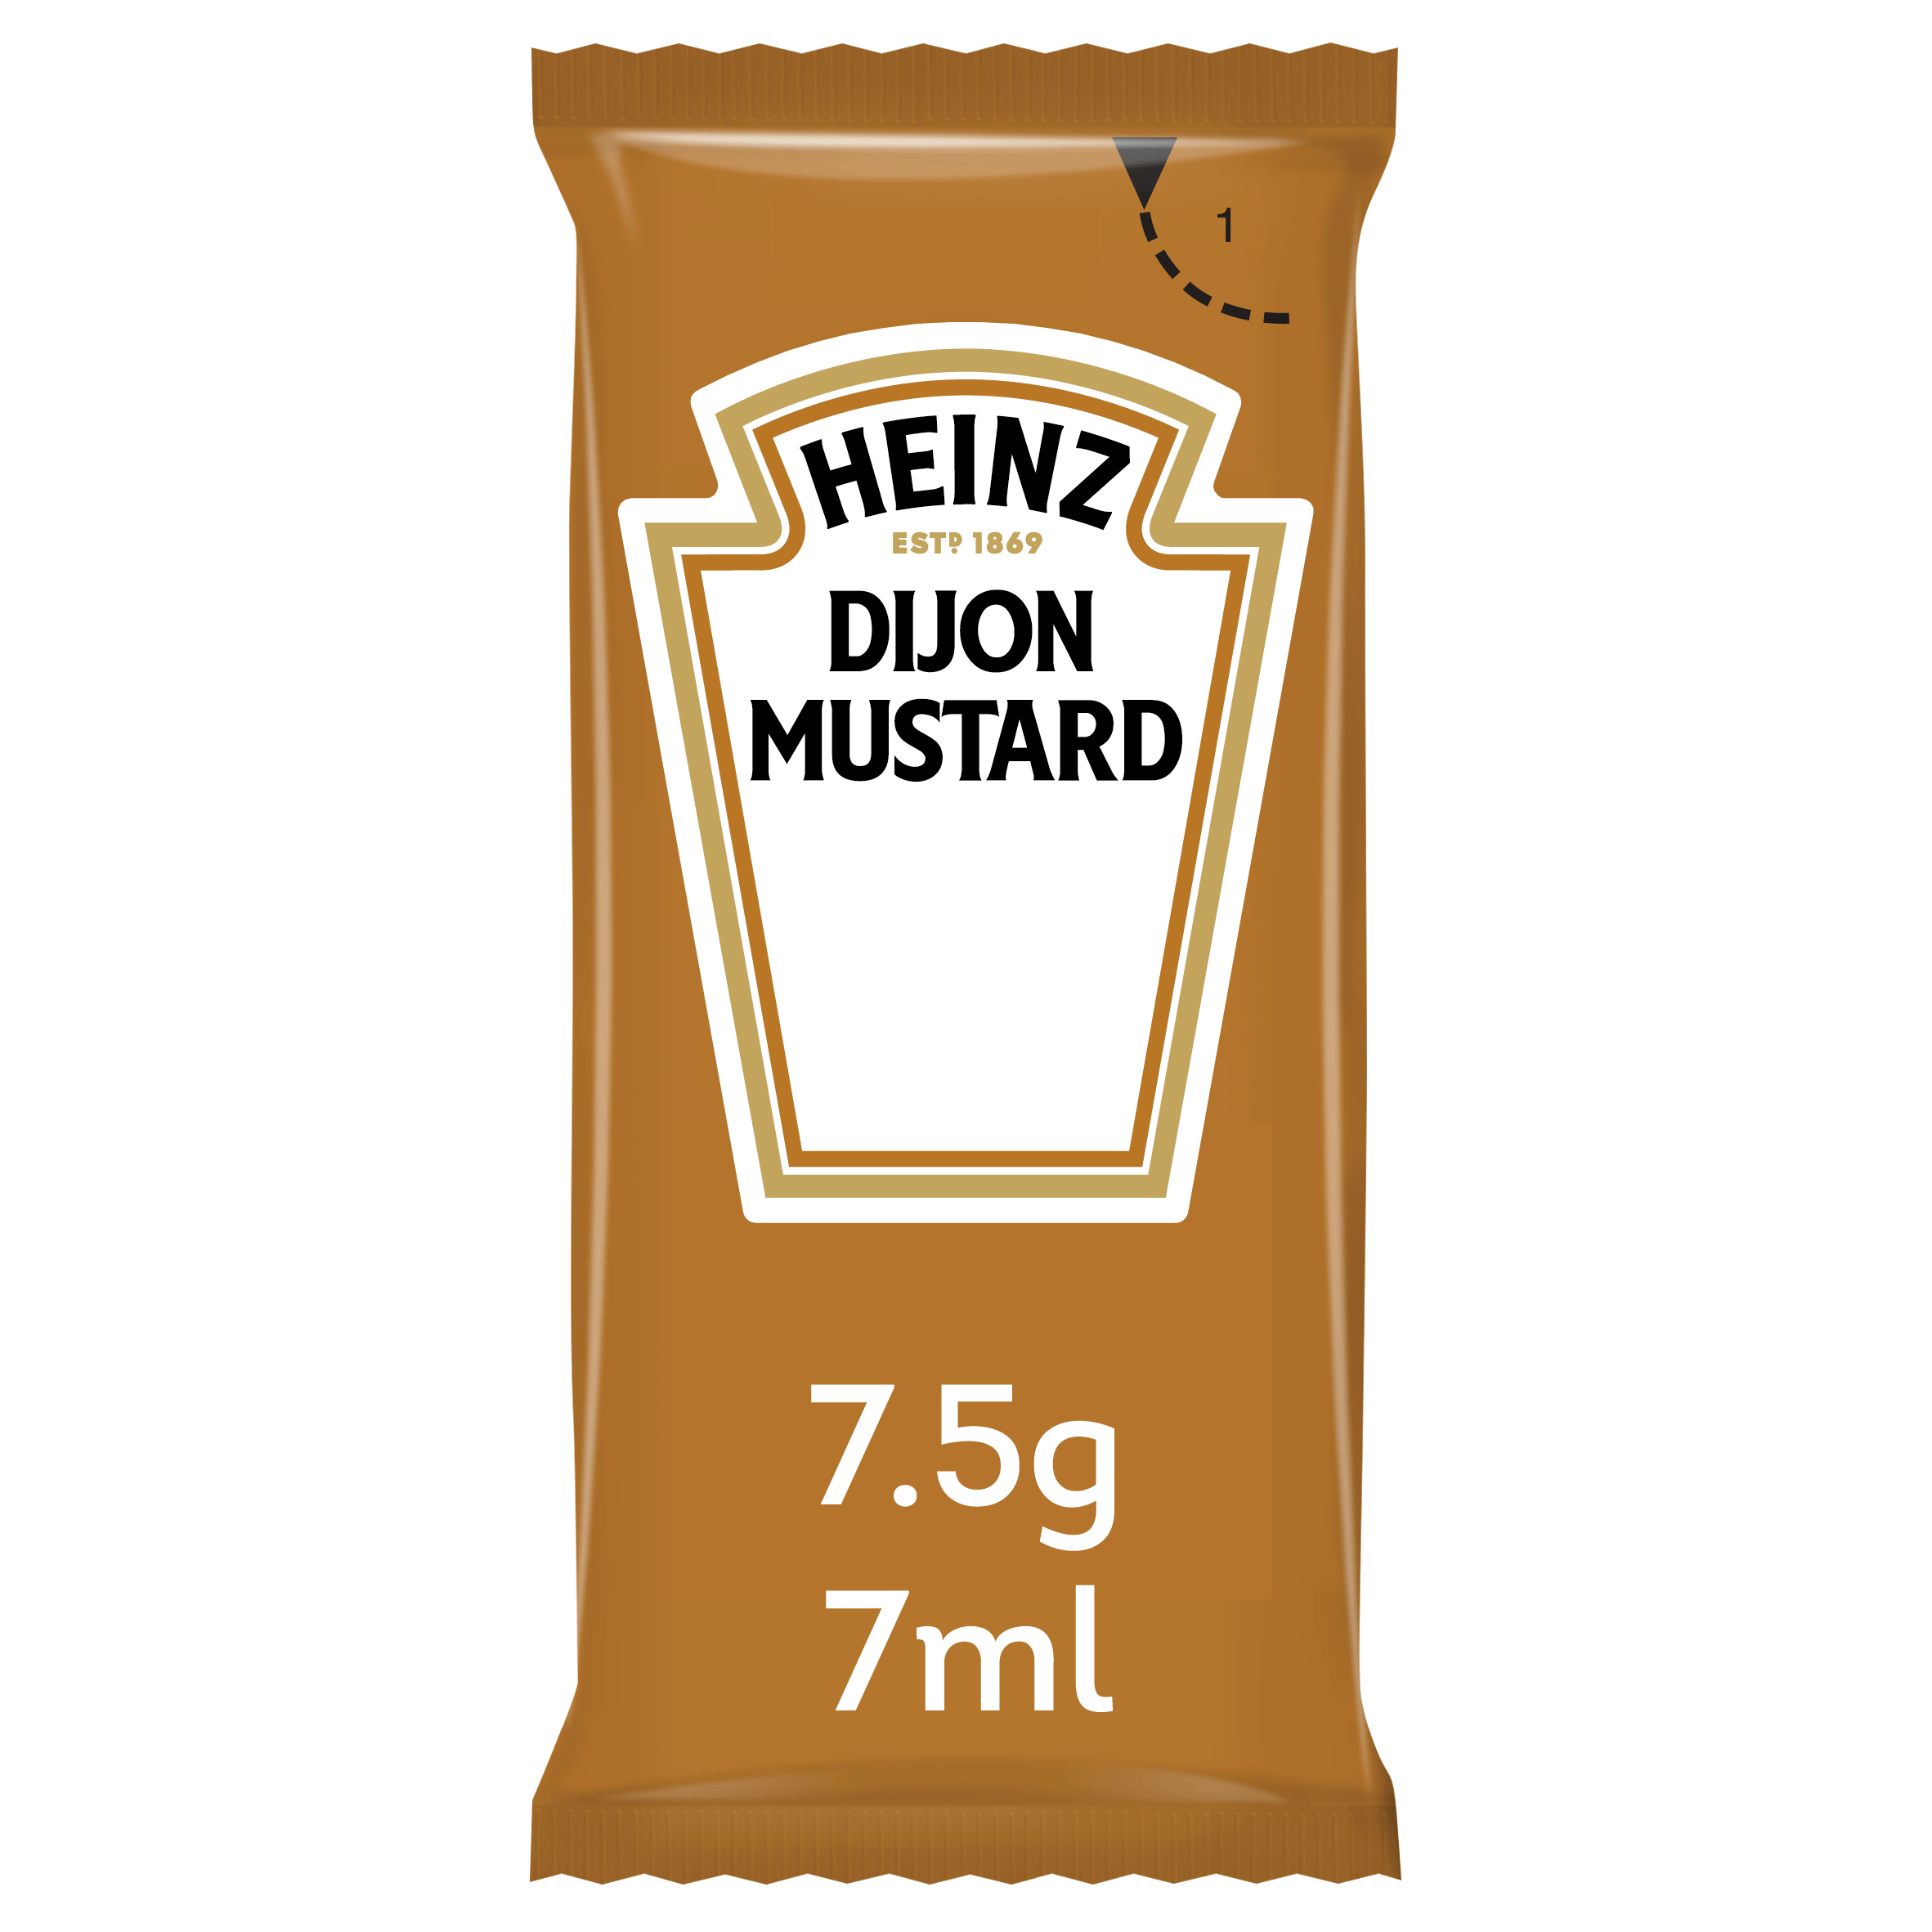 Heinz Dijon Mustard 7ml Sachet image